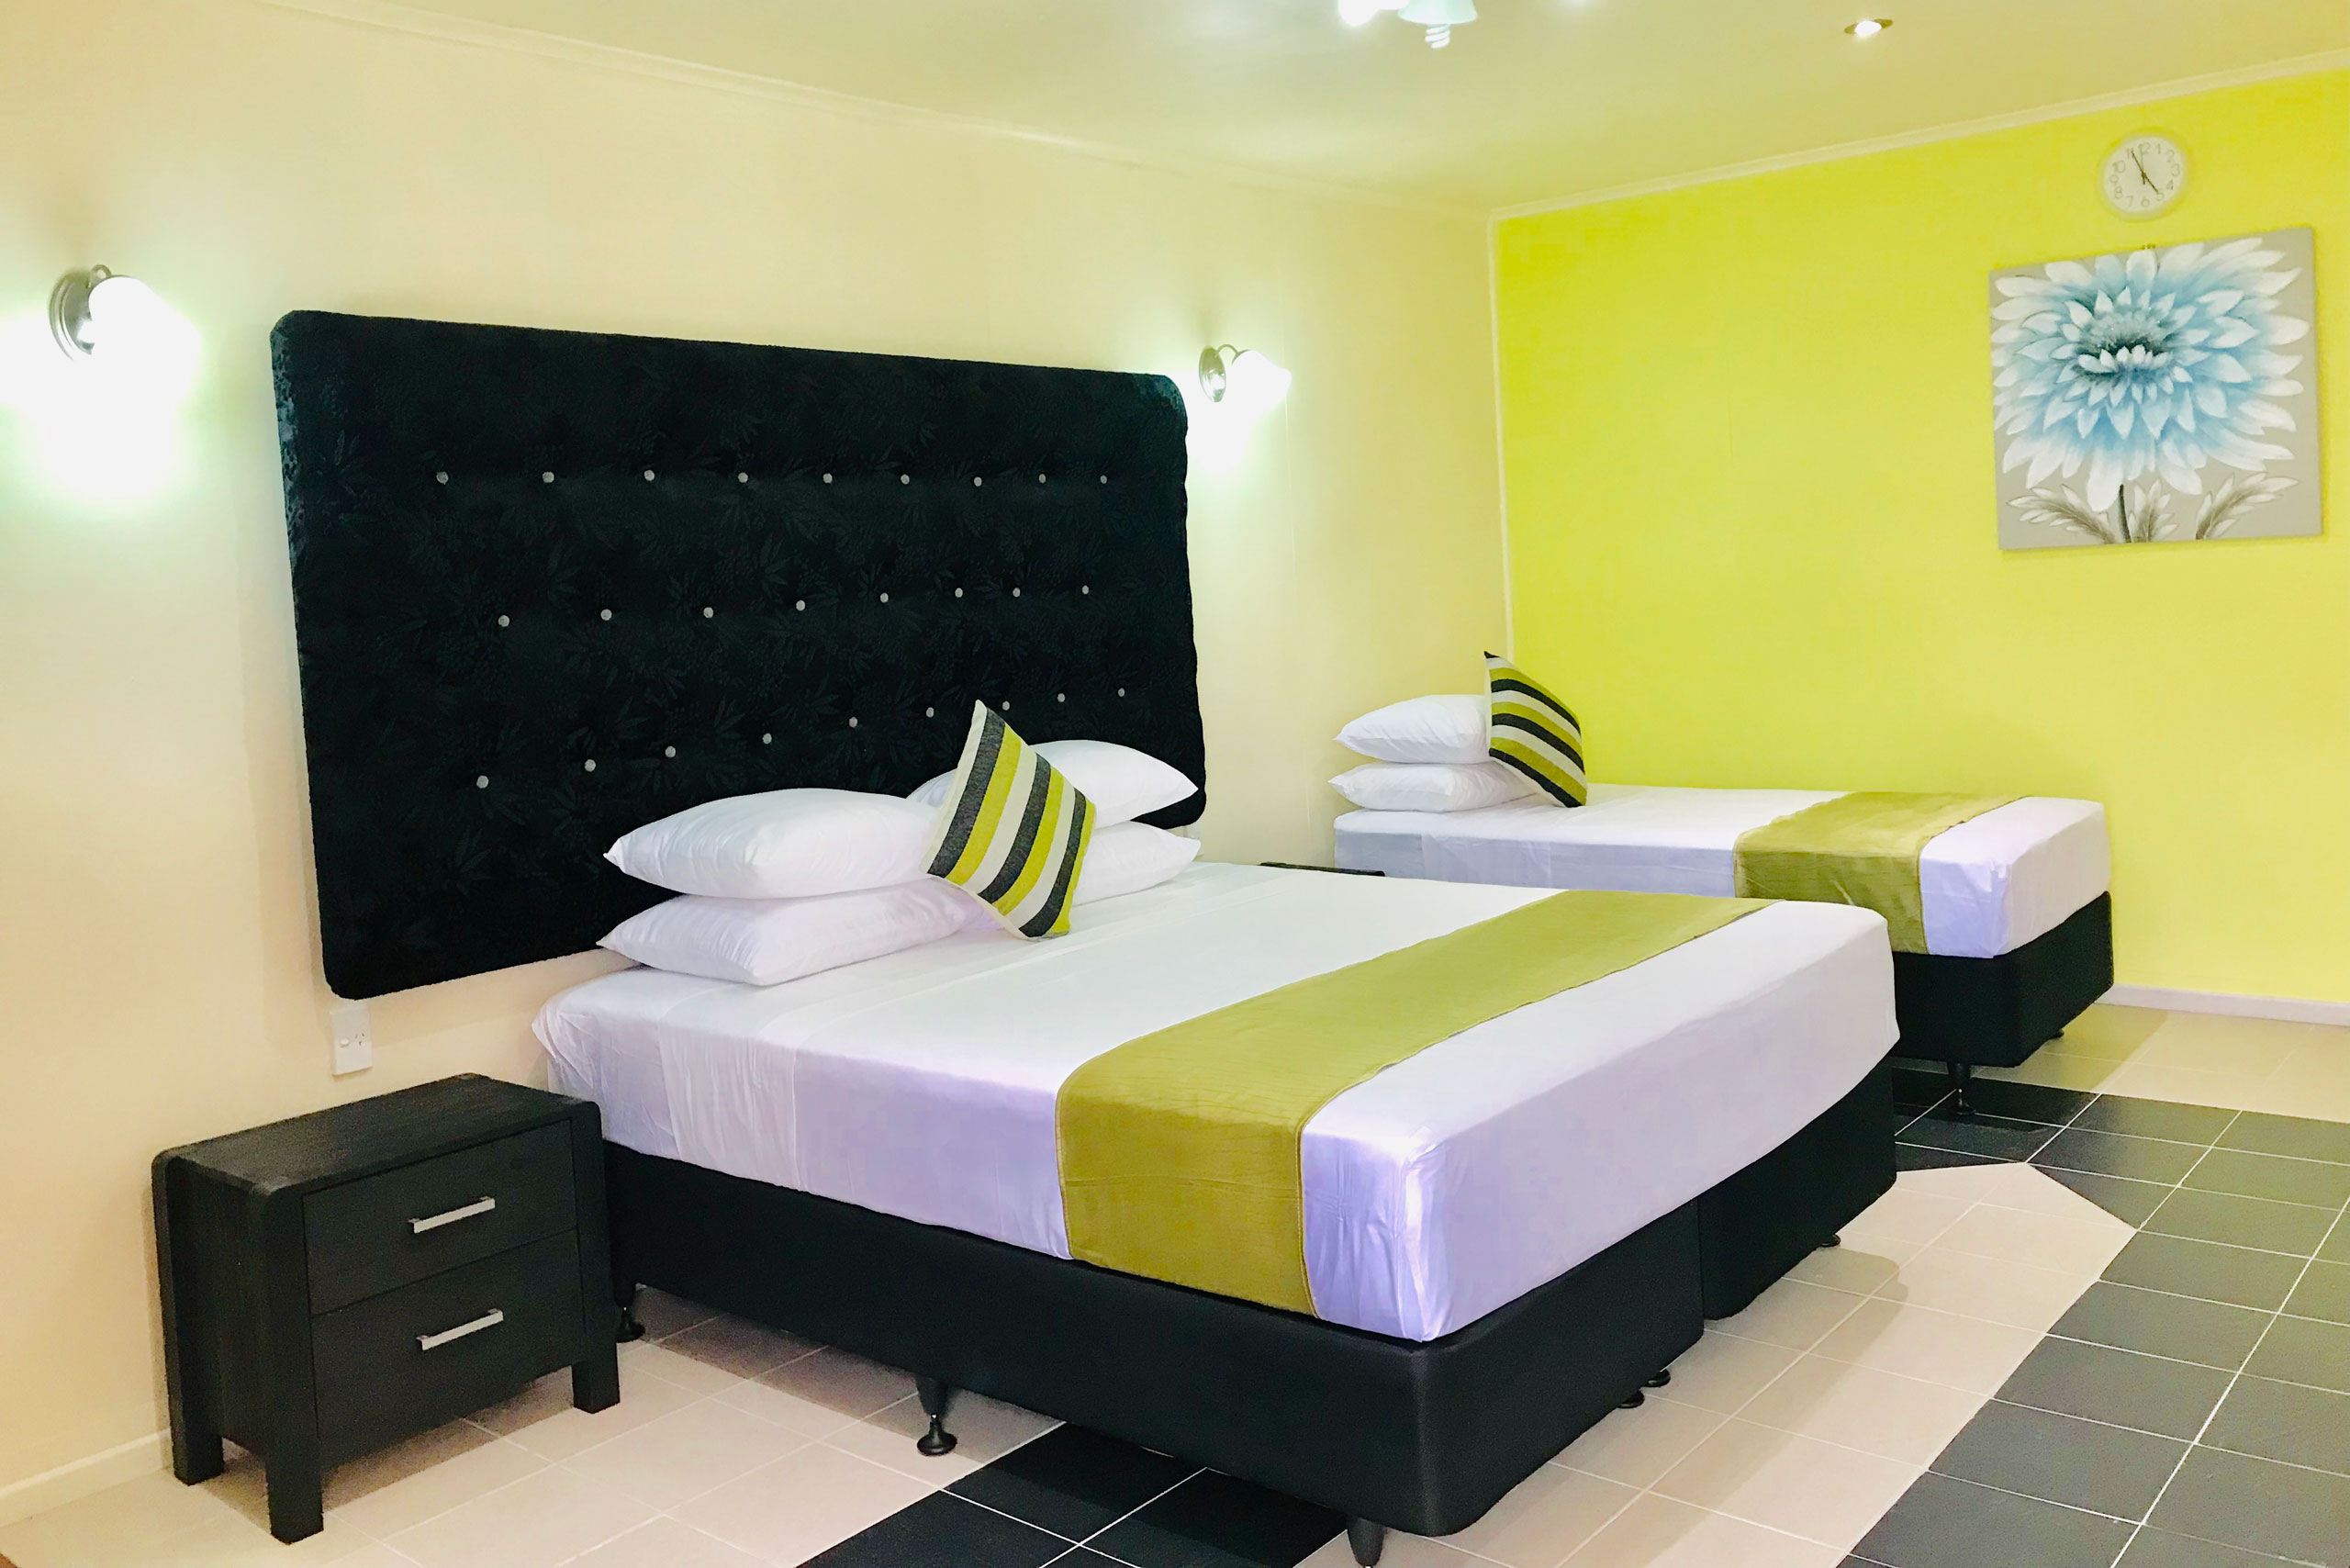 Samoa hotel room